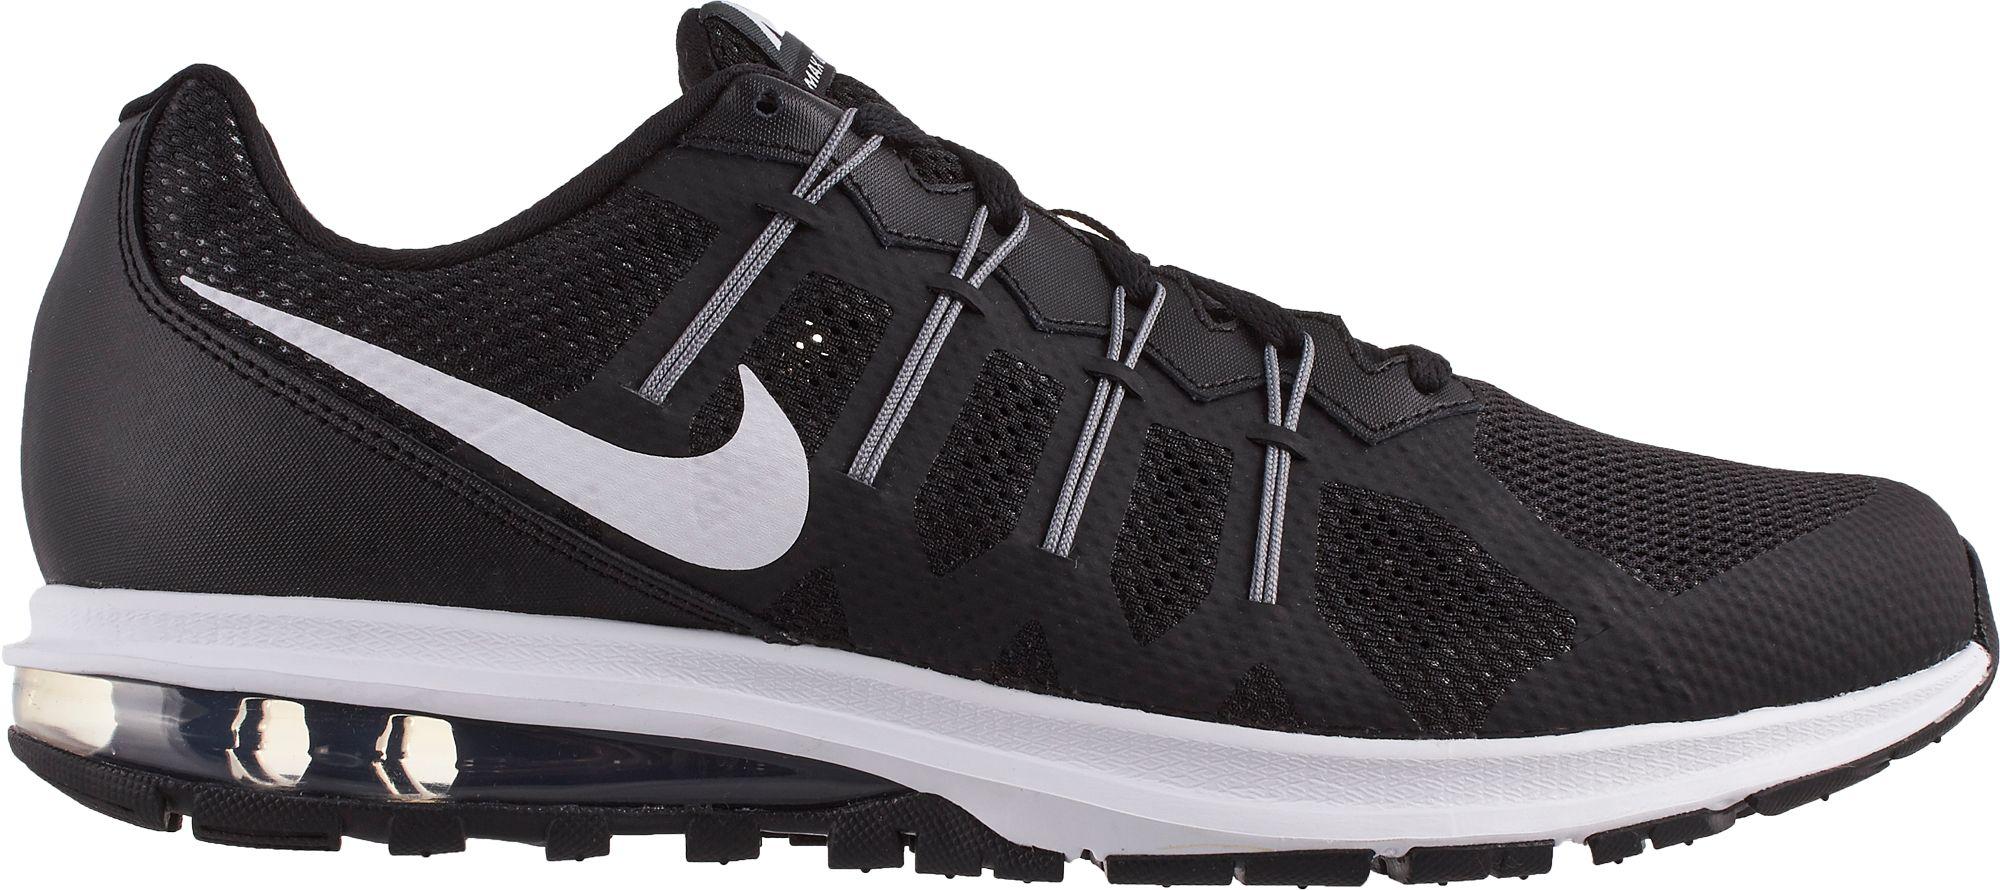 5658982f60 ... grey black size c9985 ee0d5; italy dicks sporting goodsnike mens air  max dynasty running shoes da170 2545f